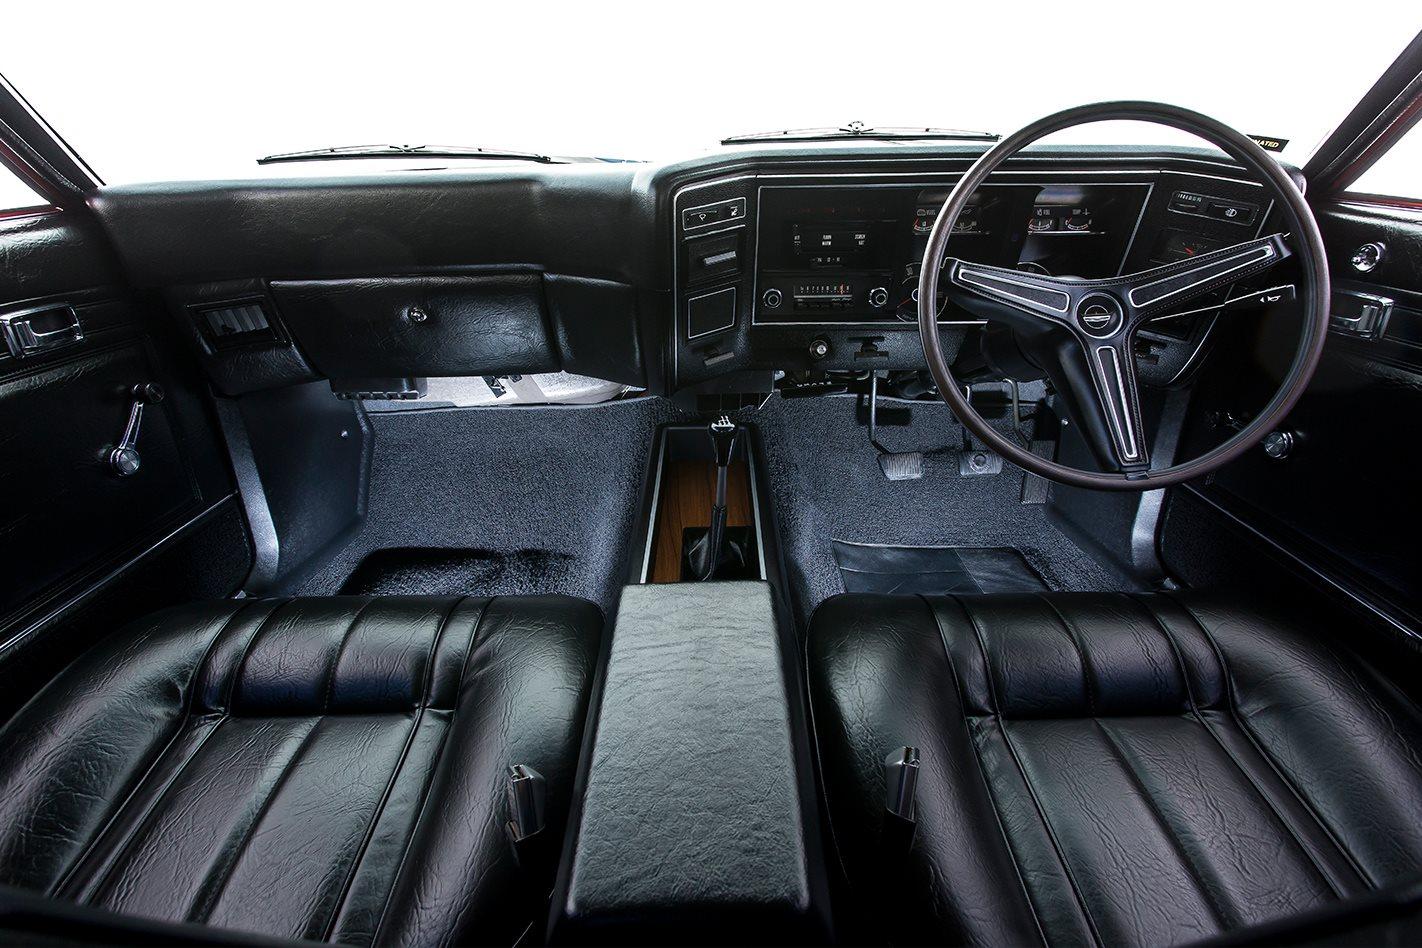 Ford Falcon XB GT hardtop interior